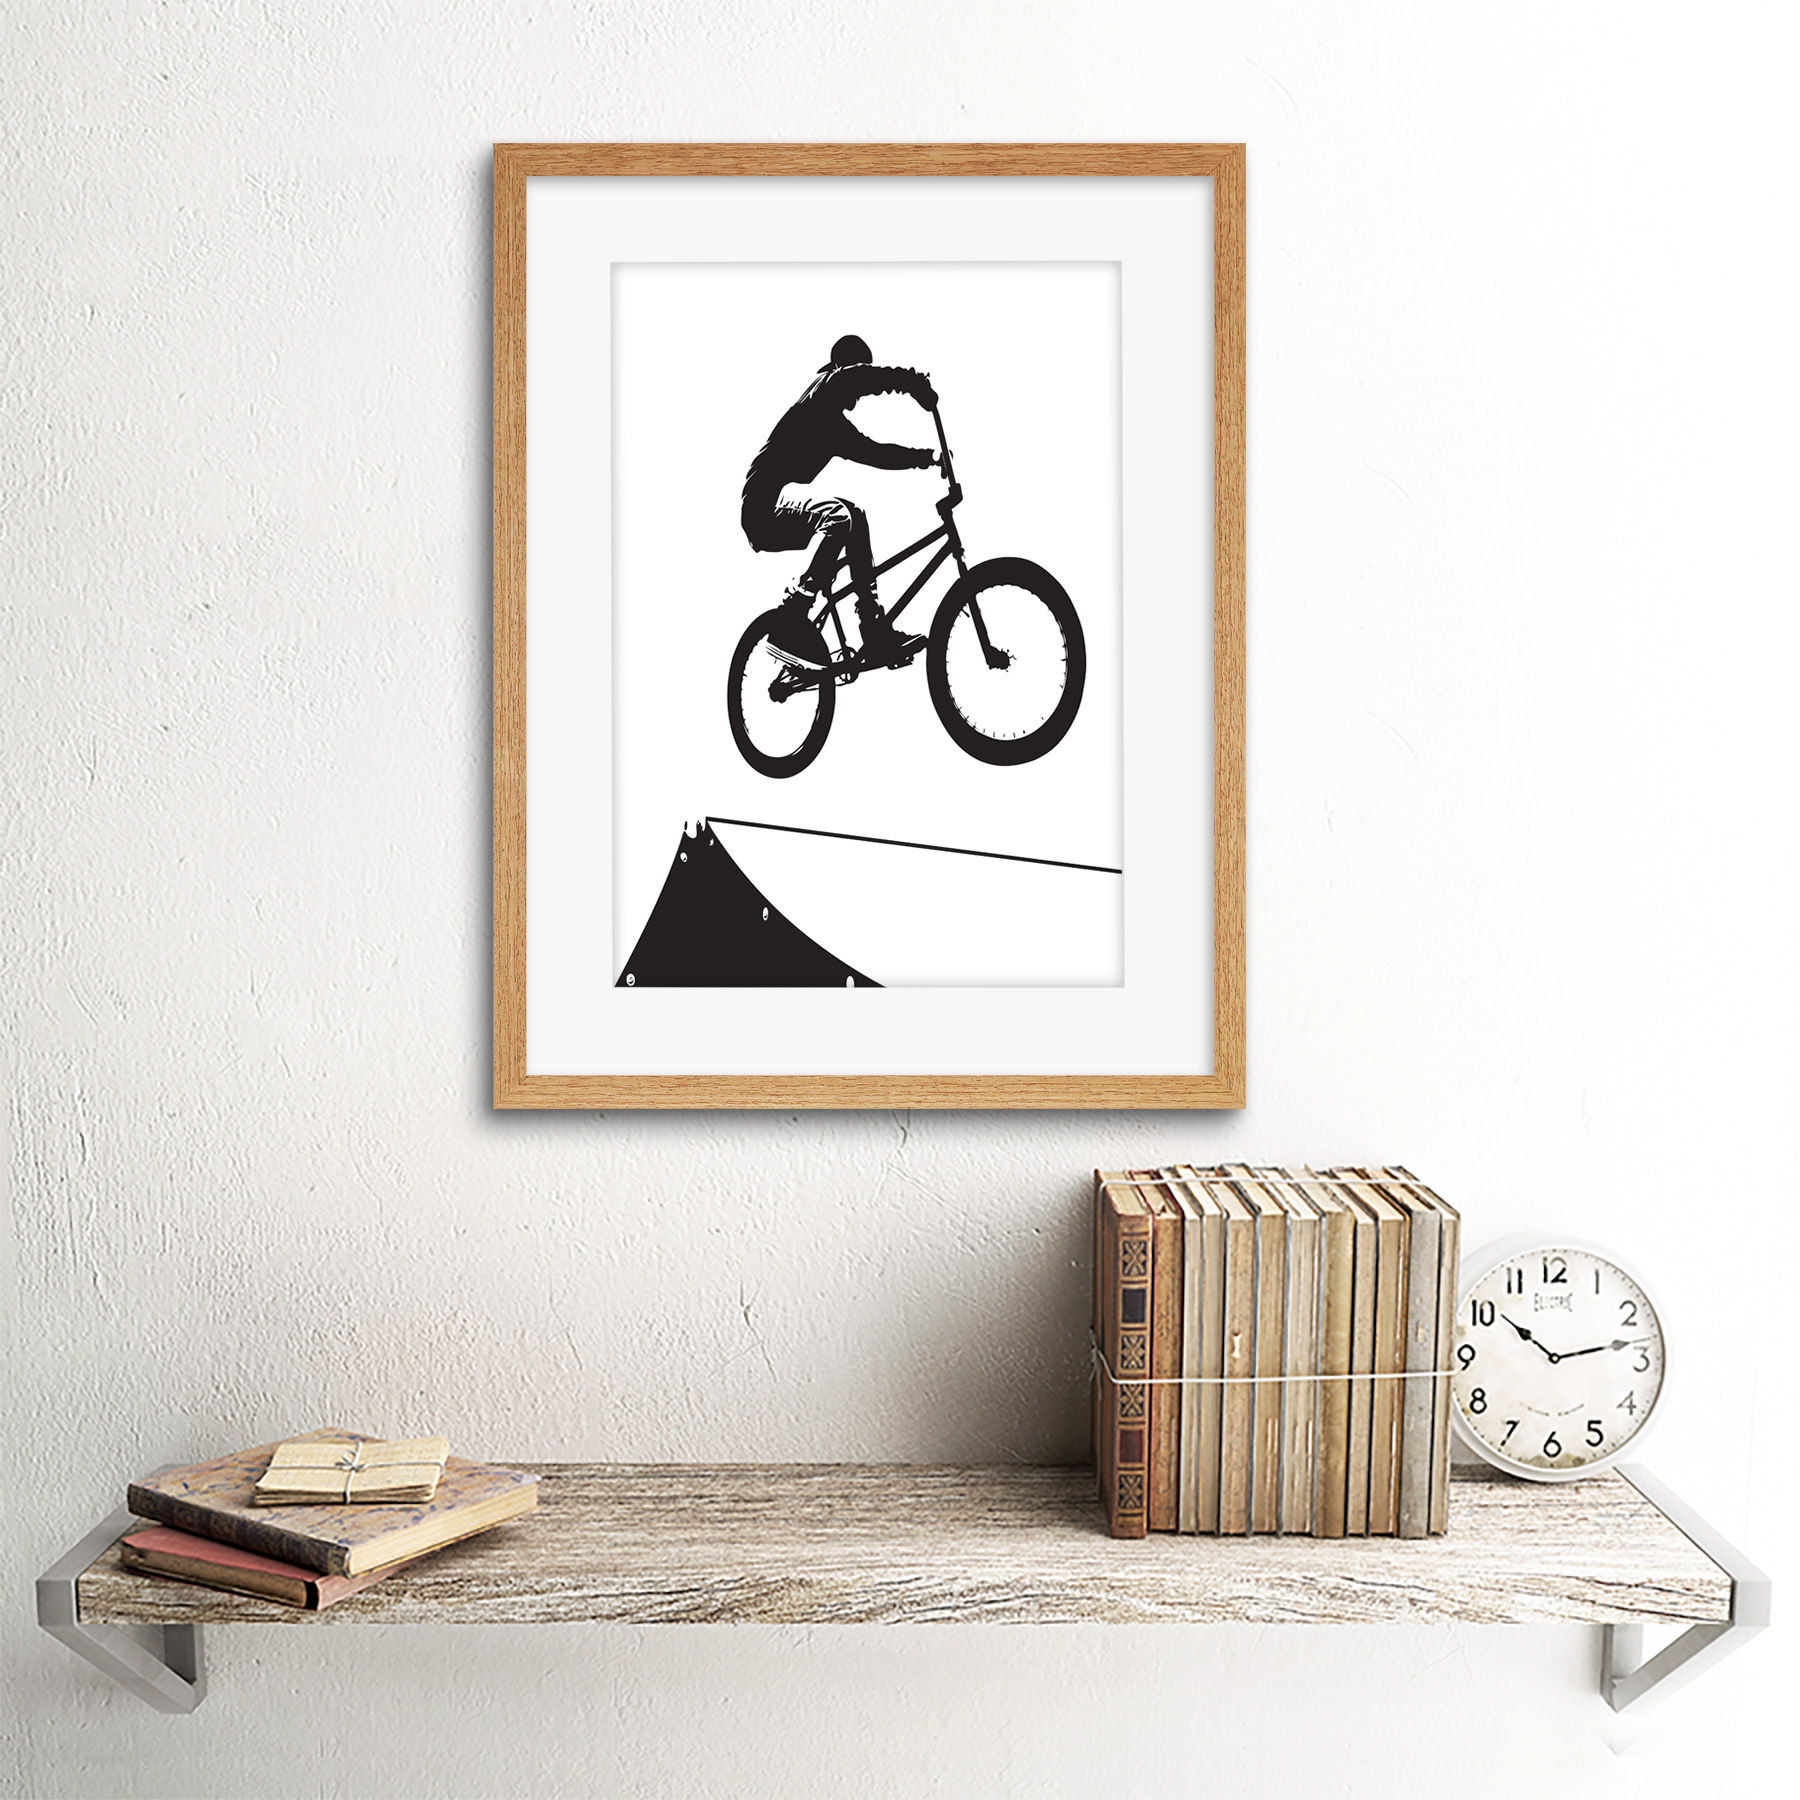 "Indexbild 13 - Painting Sport Bmx Bike Bicycle Jump Air Ramp Black White Framed Print 12x16"""